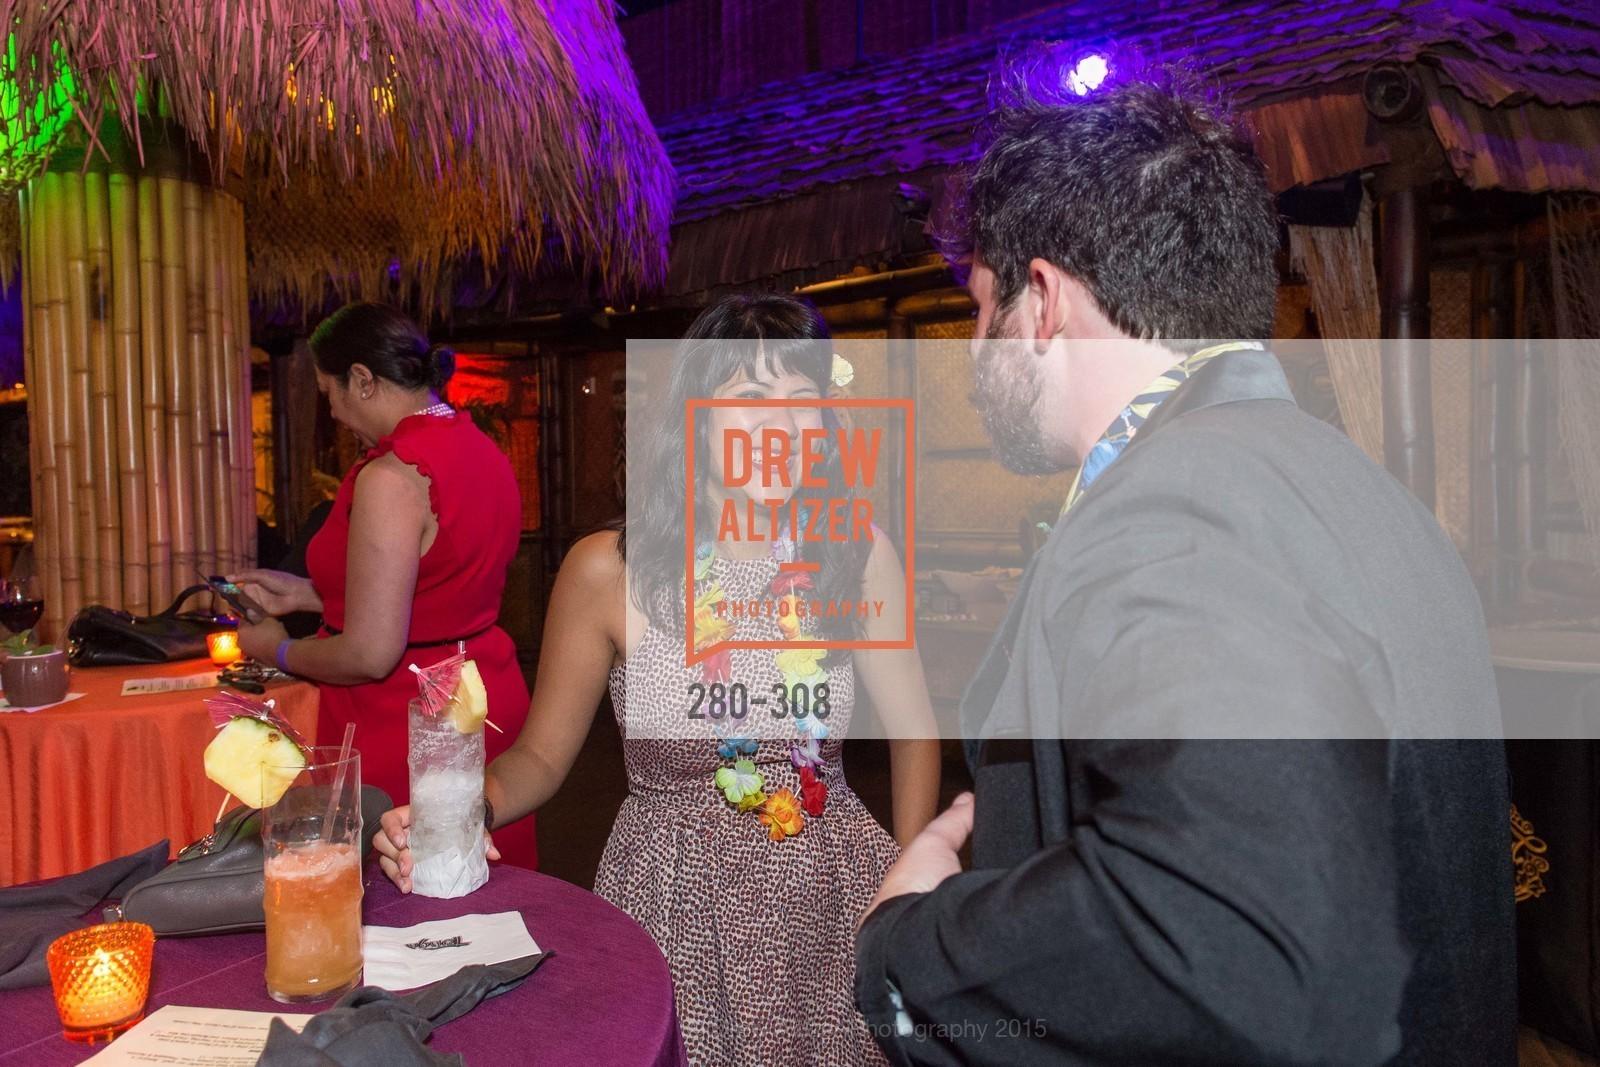 Extras, Tonga Room & Hurricane Bar Celebrates 70 Years of Tiki Glory, September 23rd, 2015, Photo,Drew Altizer, Drew Altizer Photography, full-service agency, private events, San Francisco photographer, photographer california